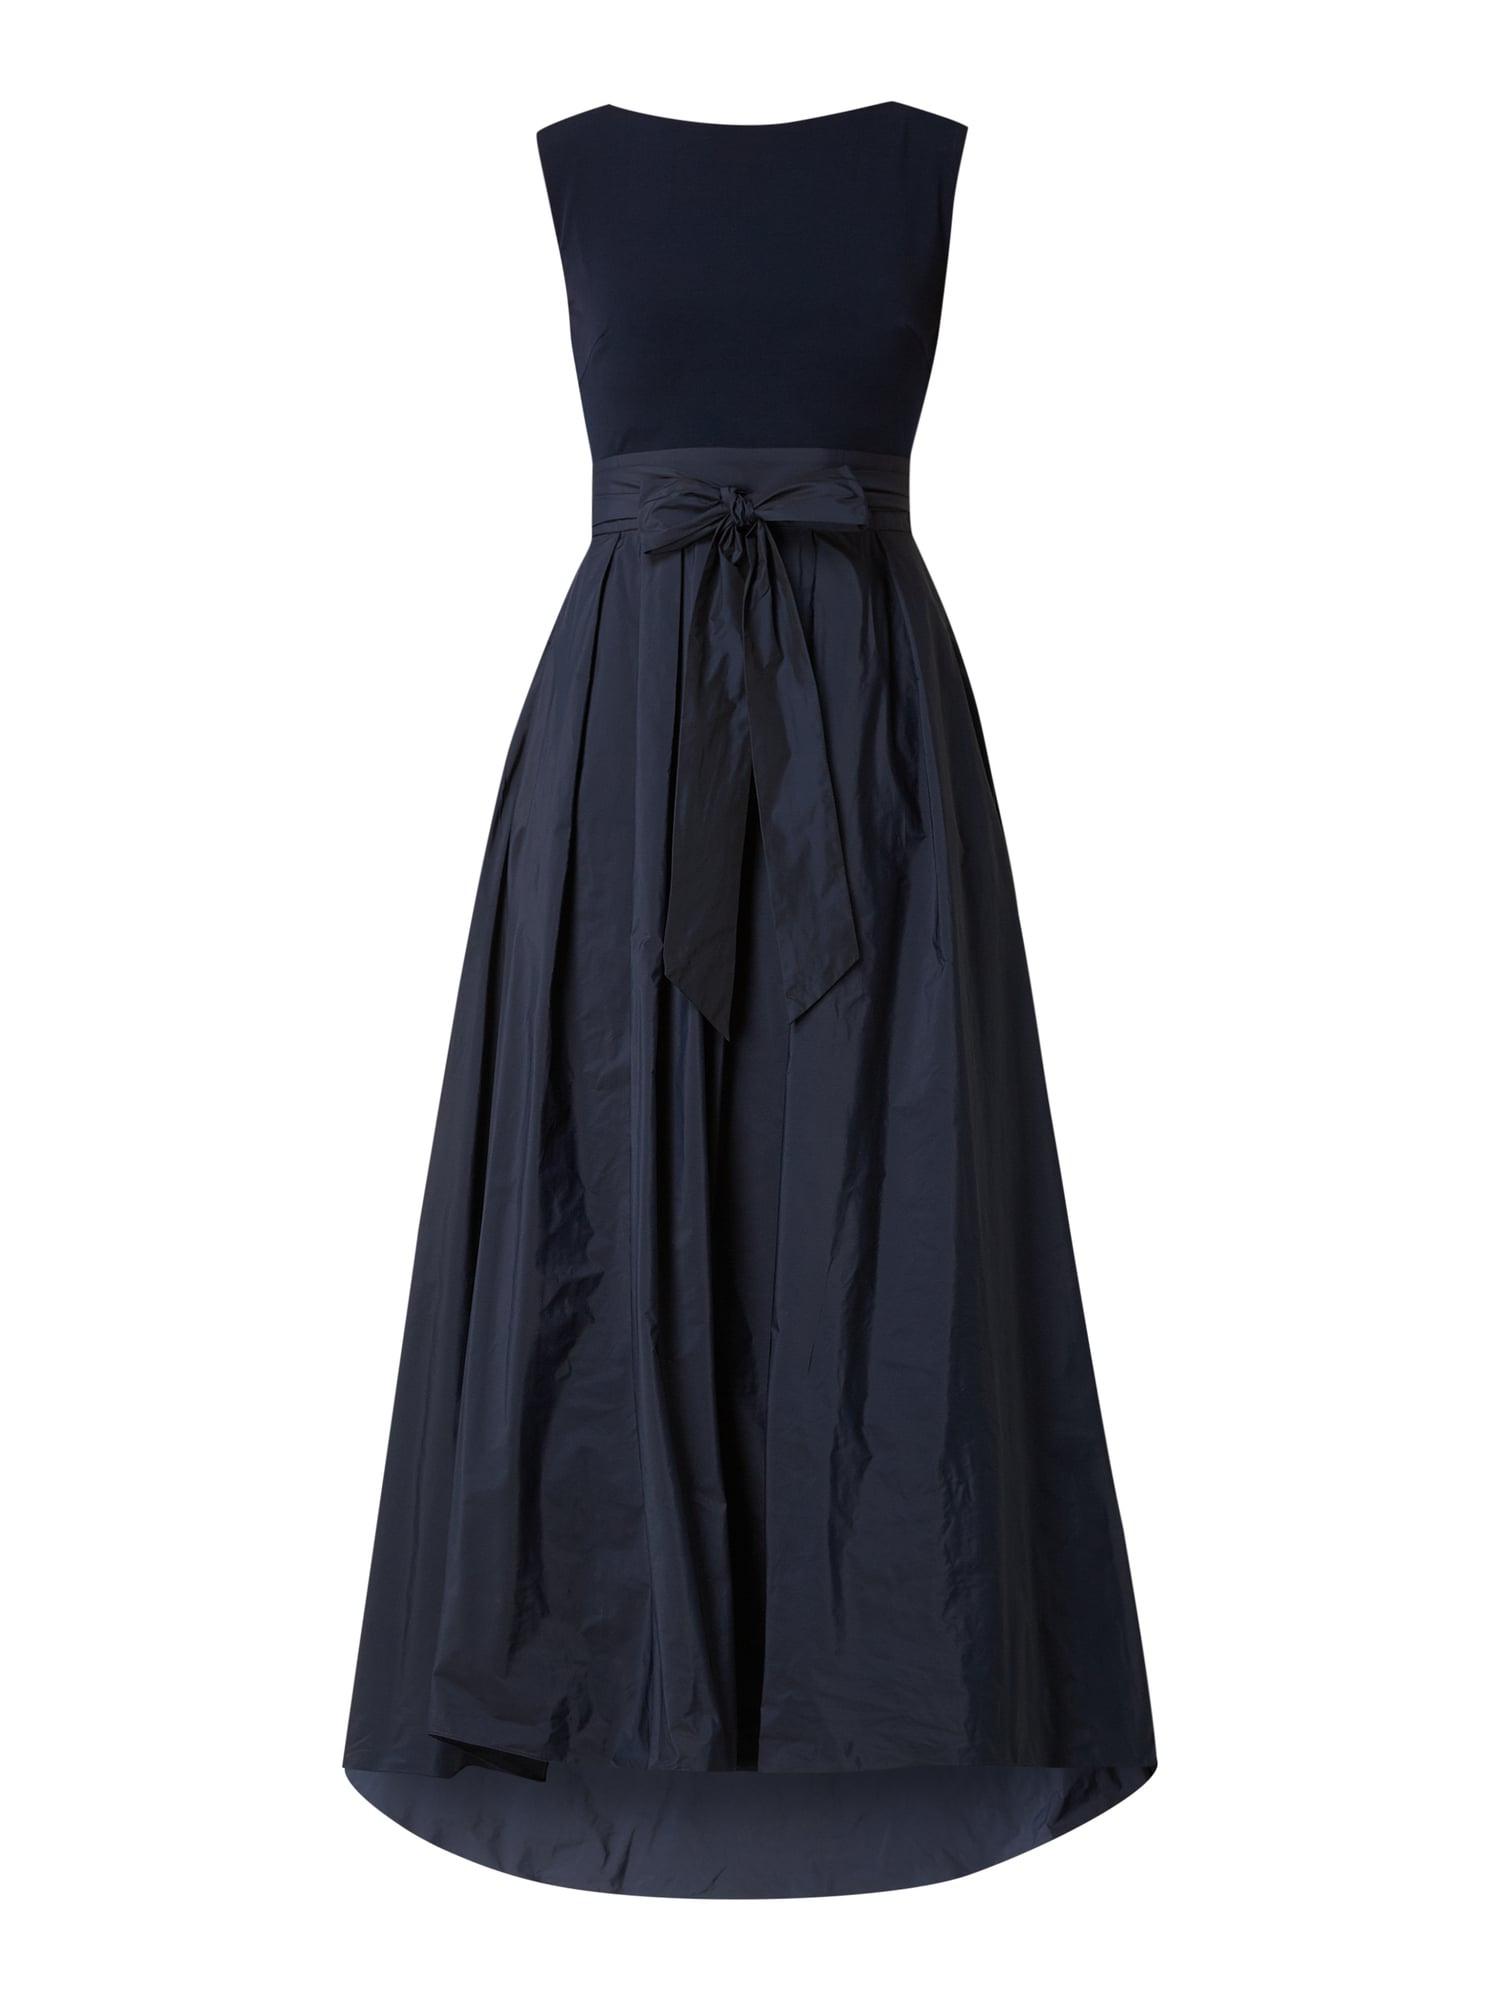 Designer Großartig P&C Abendkleid Dunkelblau für 201913 Cool P&C Abendkleid Dunkelblau Stylish